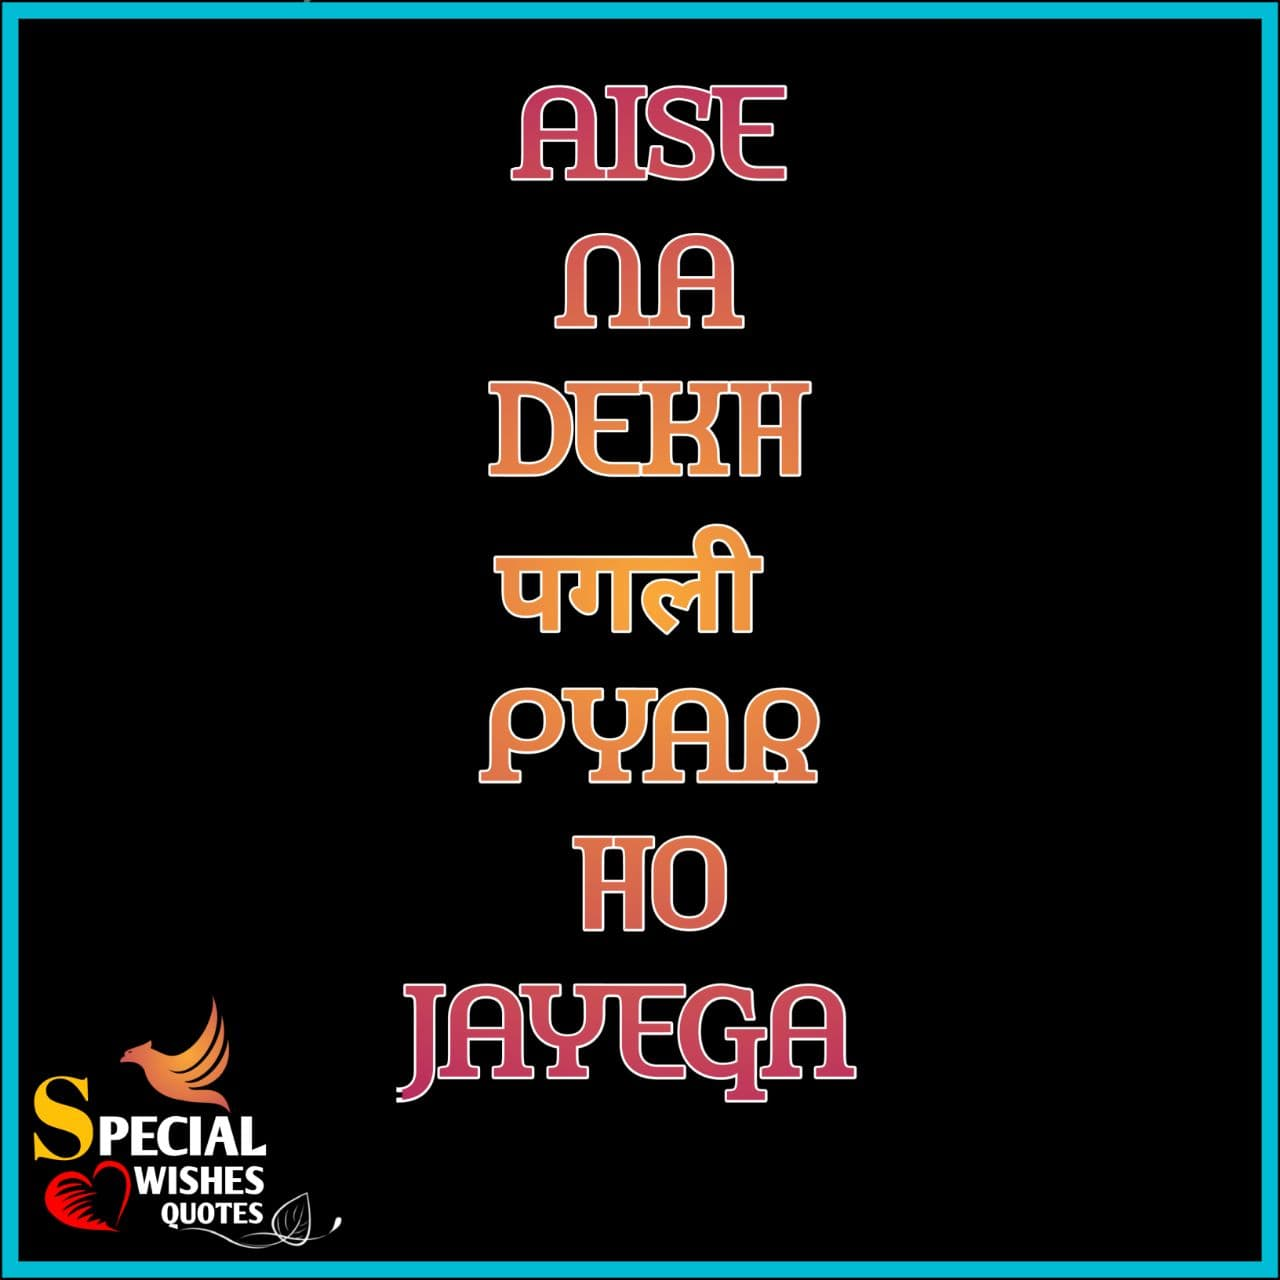 'Aise Na Dekh Pagli Pyar Ho Jayega Attitude Dp Image'